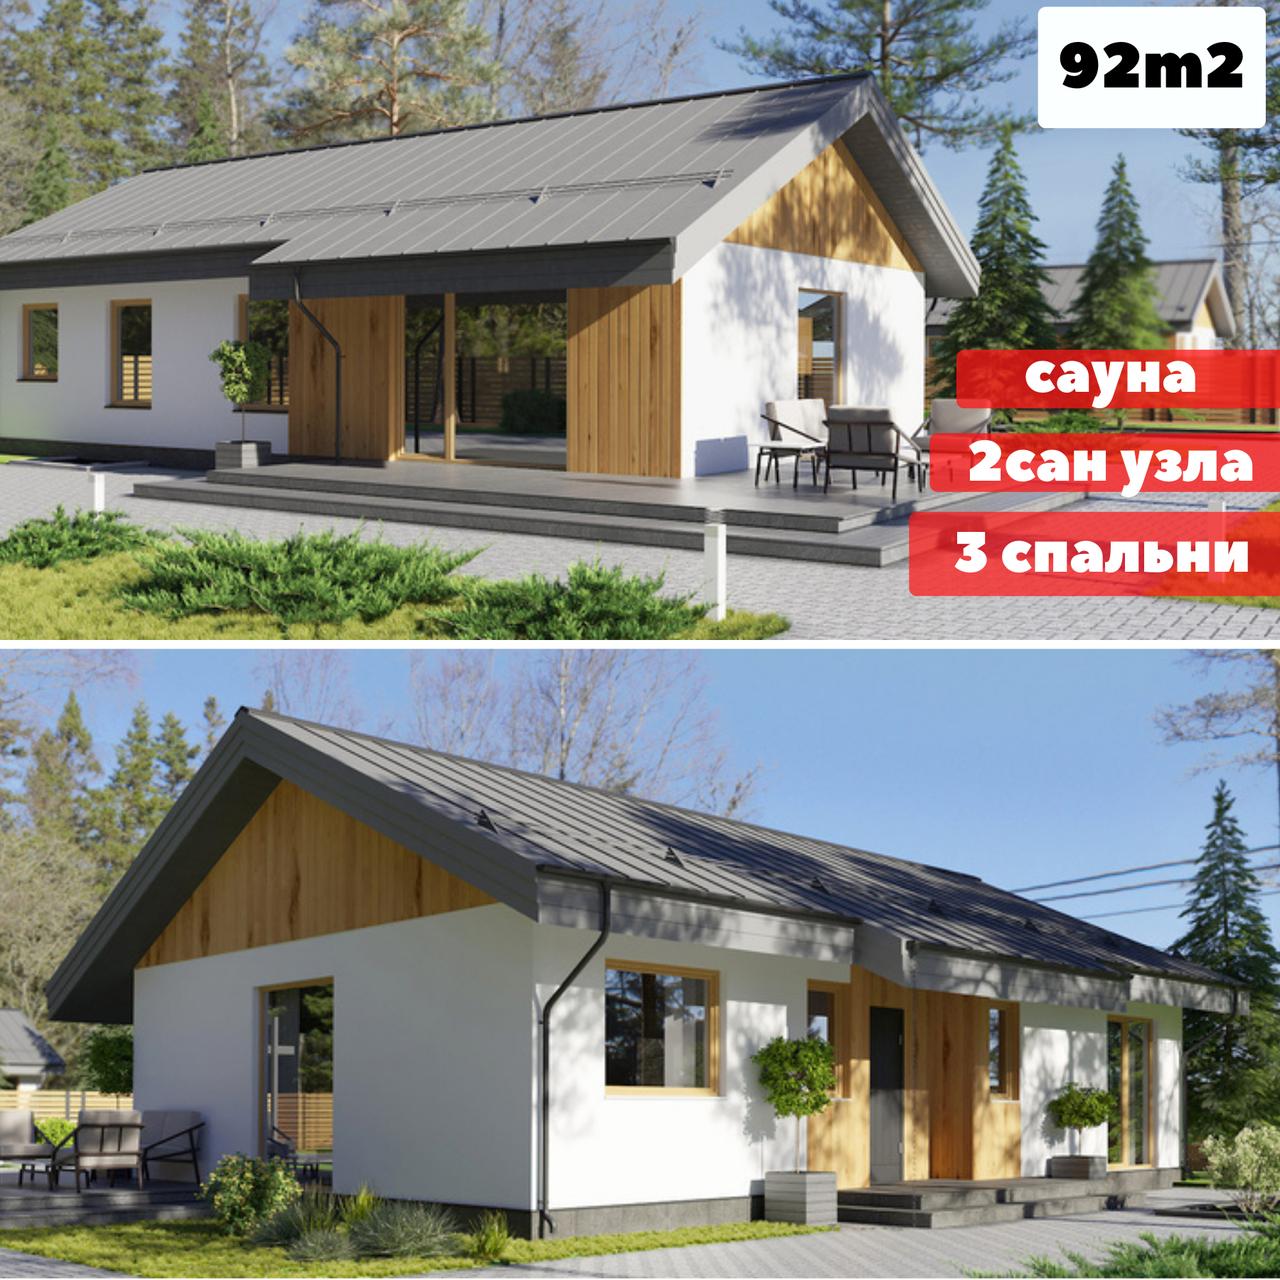 Каркасно модульный дом 92m2 из ЛСТК 14х8m